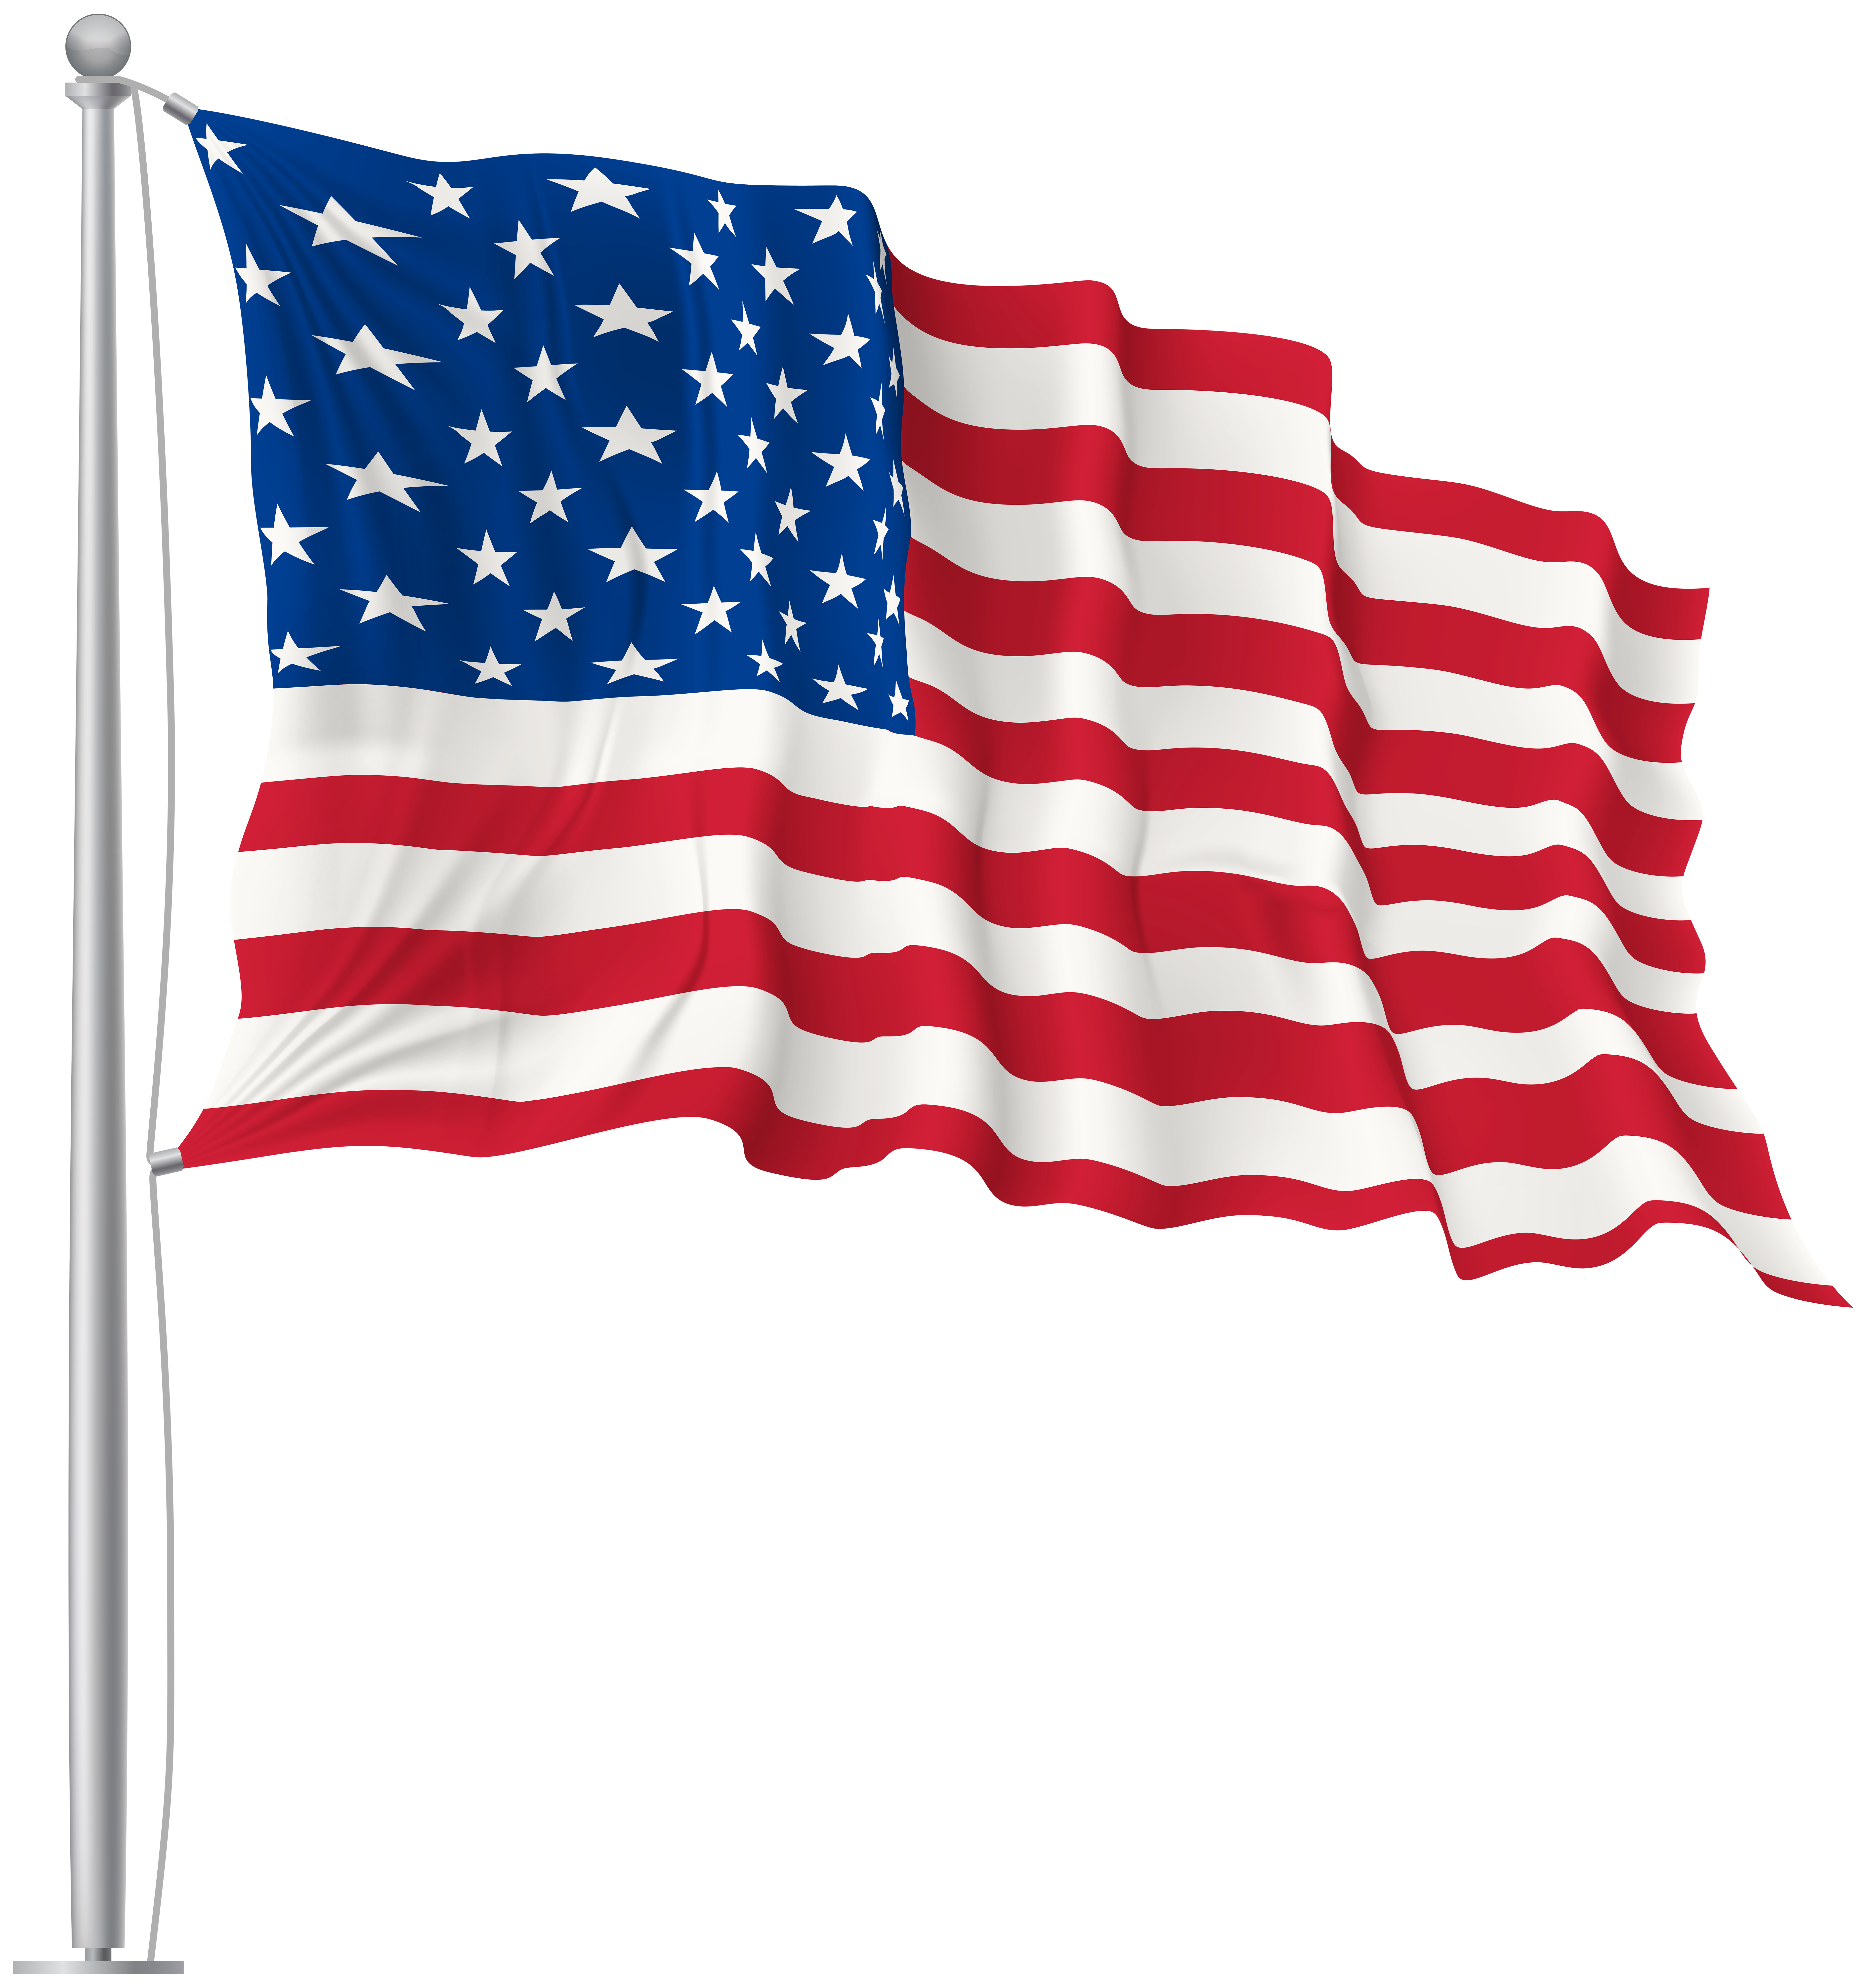 Pennant clipart flag american, Pennant flag american.